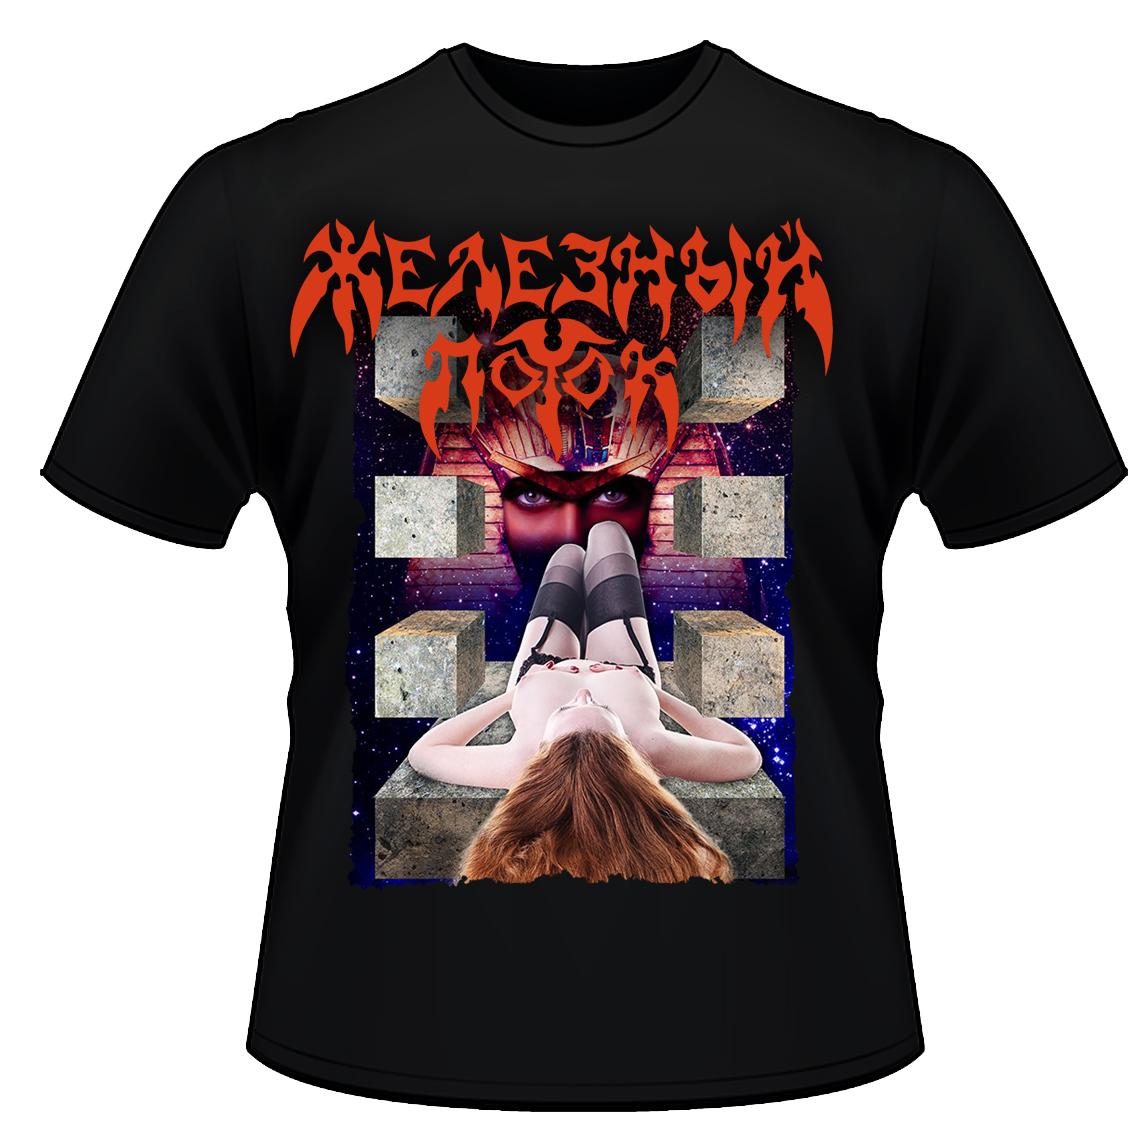 Железный Поток - (T-Shirt) - Pre-Sale